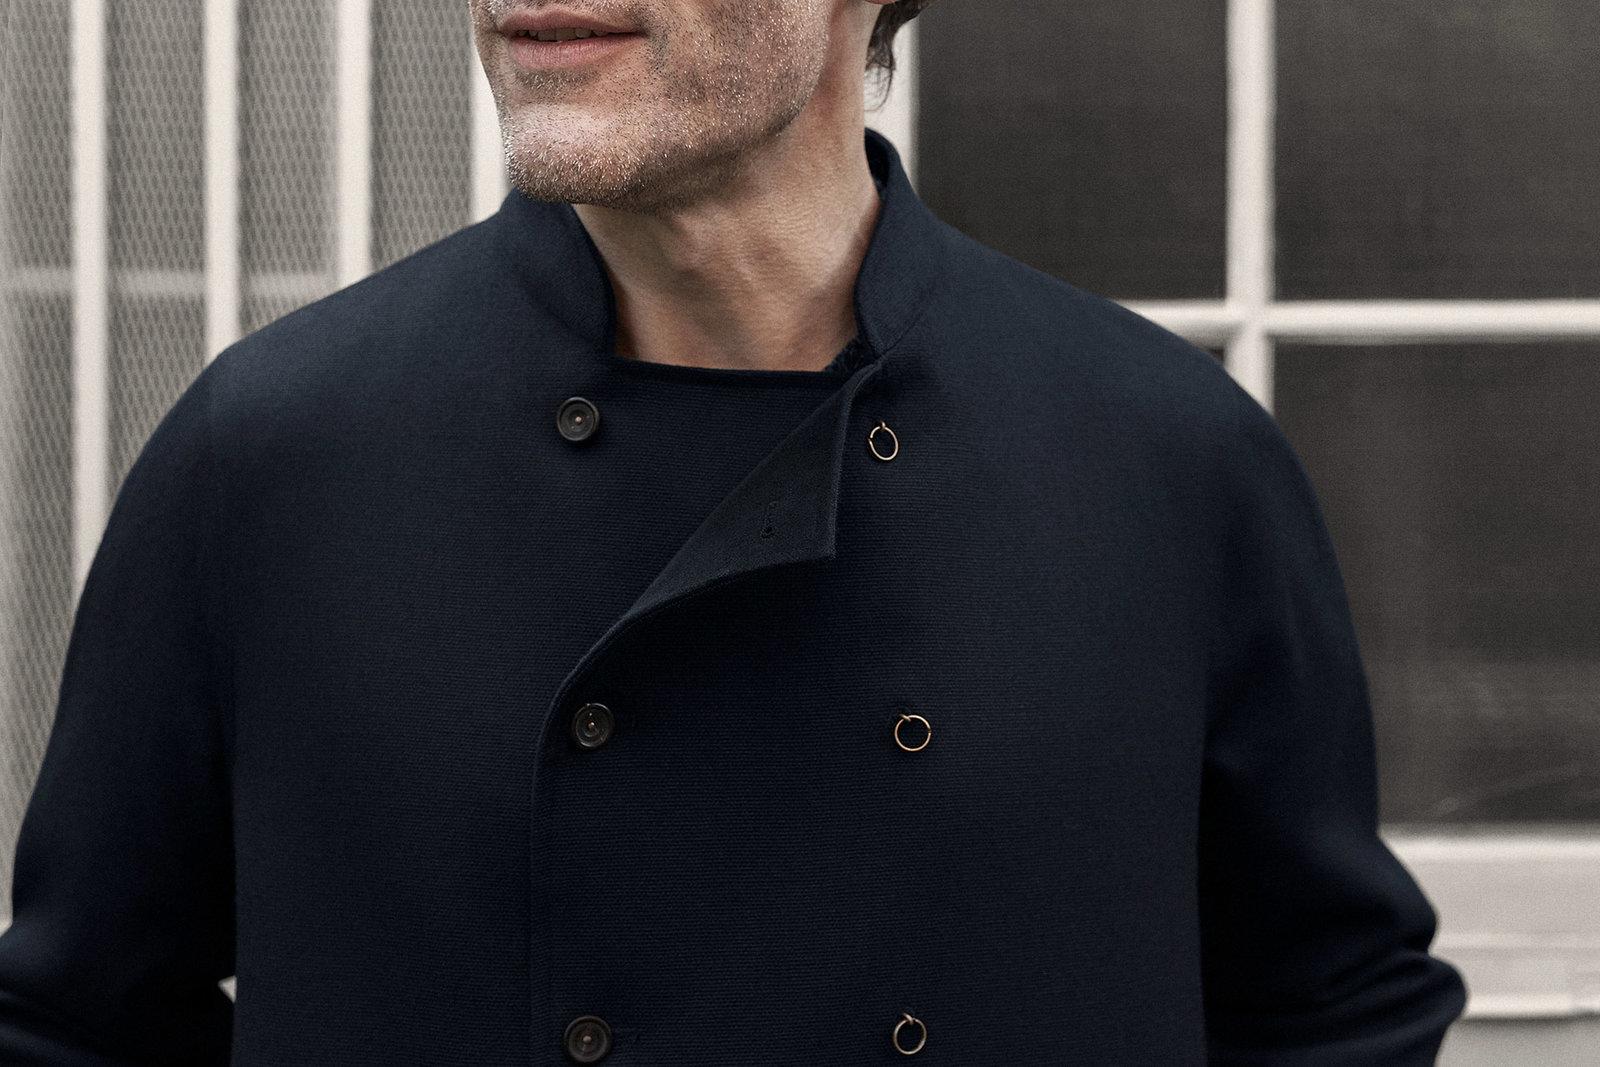 cooks-jacket-worsted-moleskin-midnight-worn-2@2x.jpg